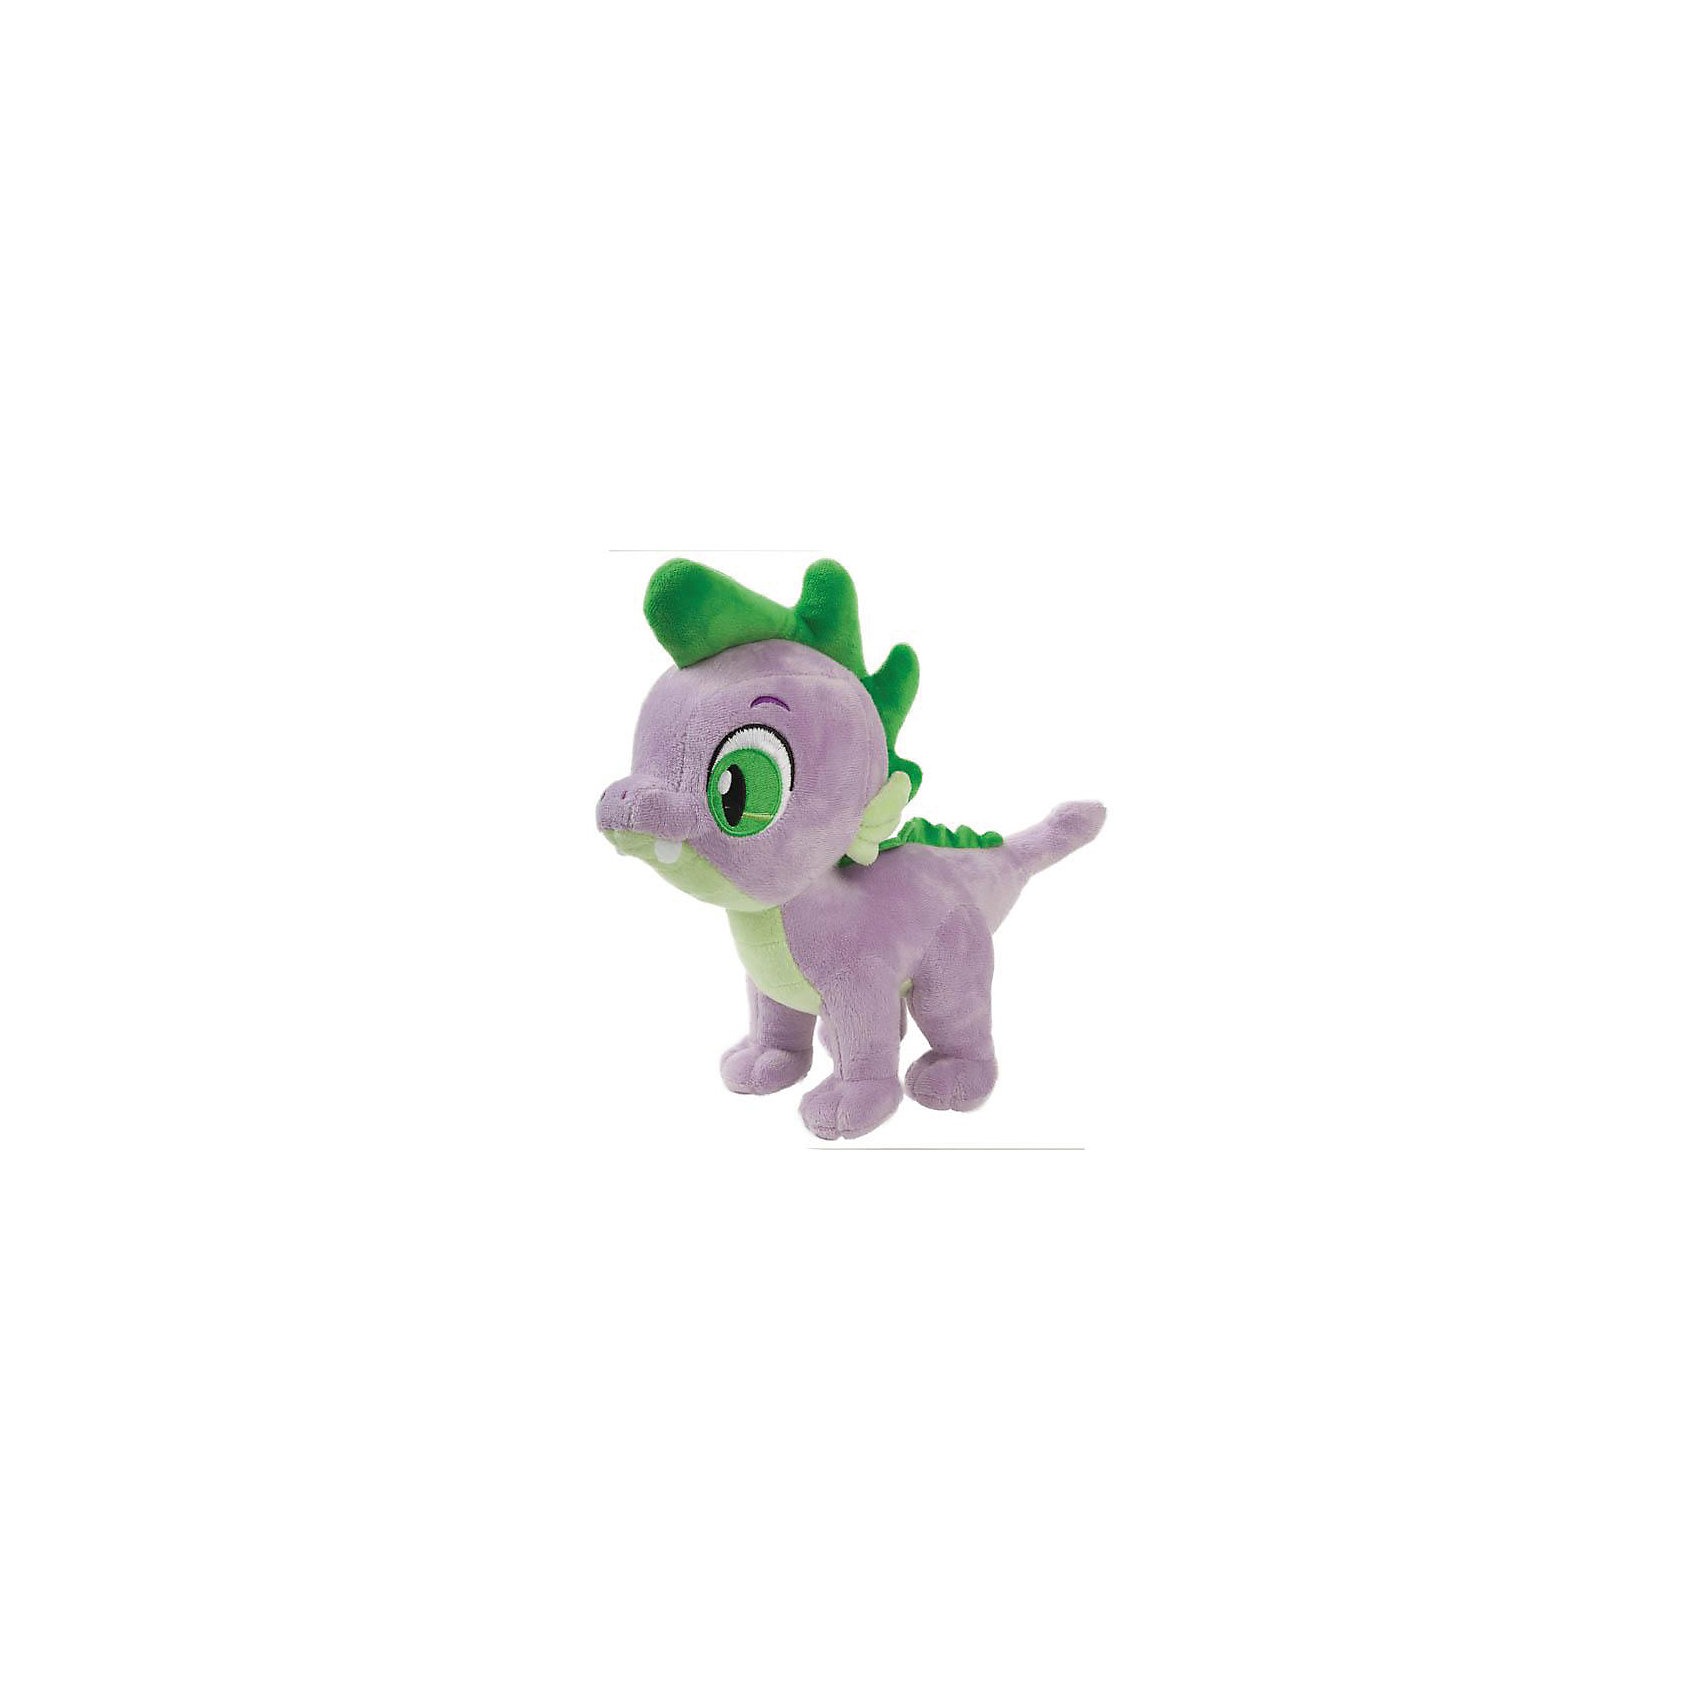 МУЛЬТИ-ПУЛЬТИ Мягкая игрушка Динозаврик Спайк, со звуком,  23 см, My little Pony, МУЛЬТИ-ПУЛЬТИ мульти пульти мягкая игрушка заяц топотун со звуком disney мульти пульти